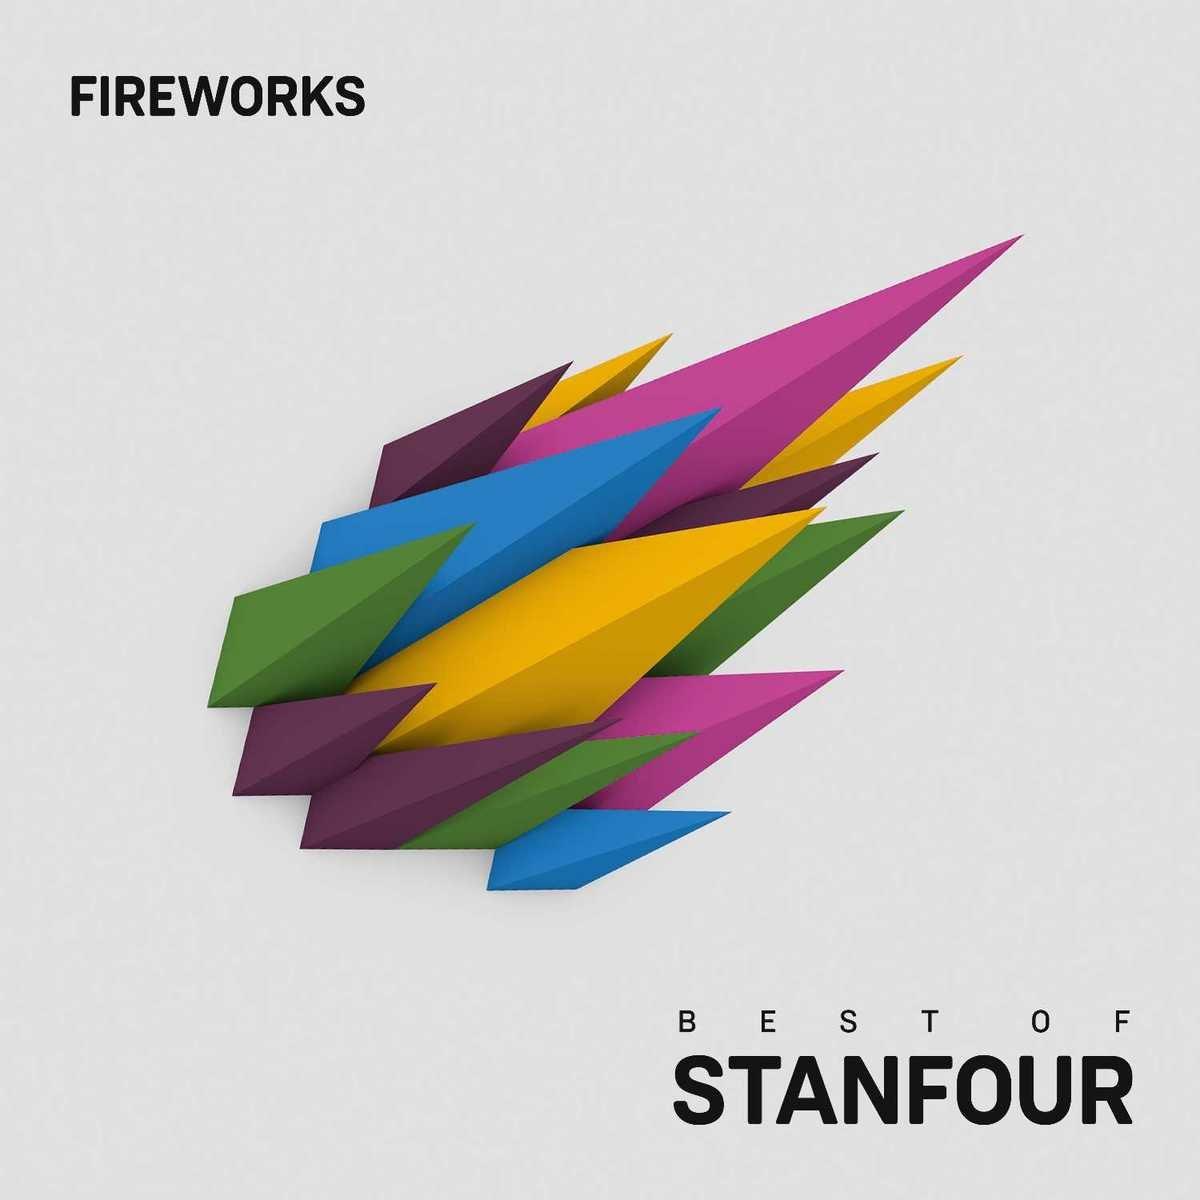 Fireworks Best Of Stanfour Musik Origami Diagram